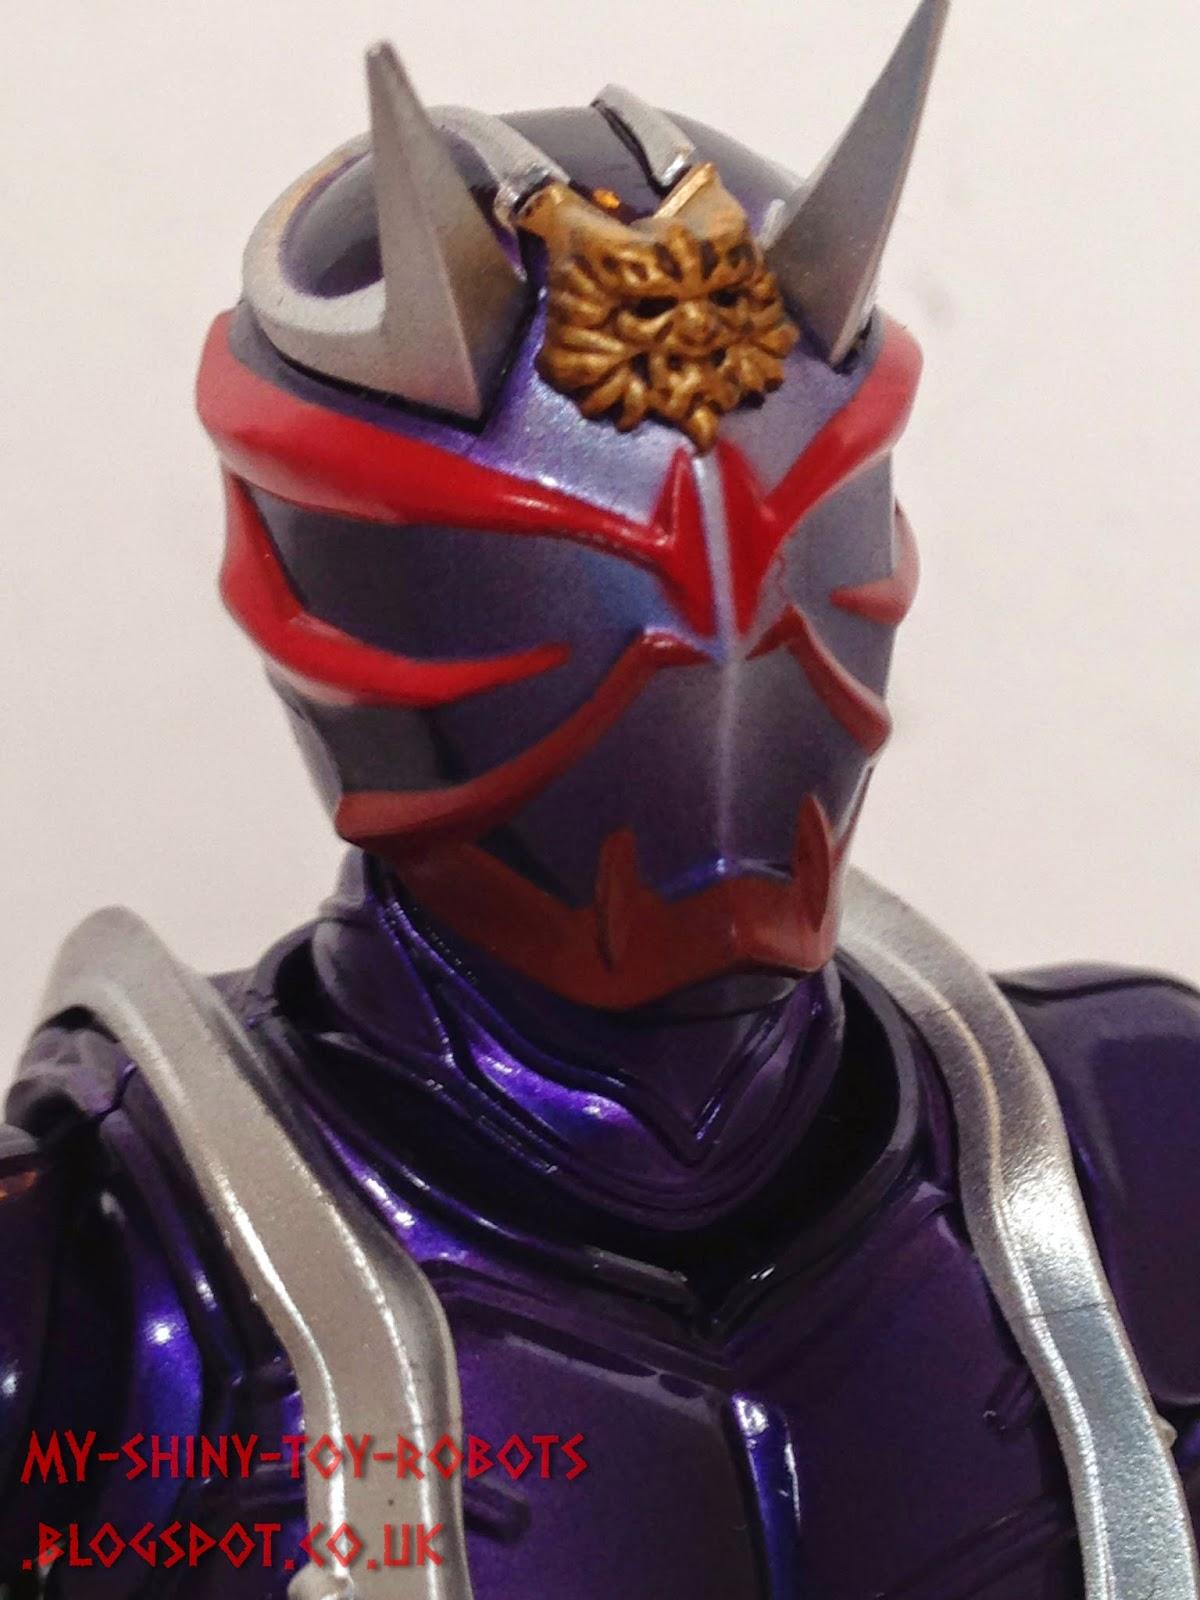 SH Figuarts Kamen Rider Hibiki